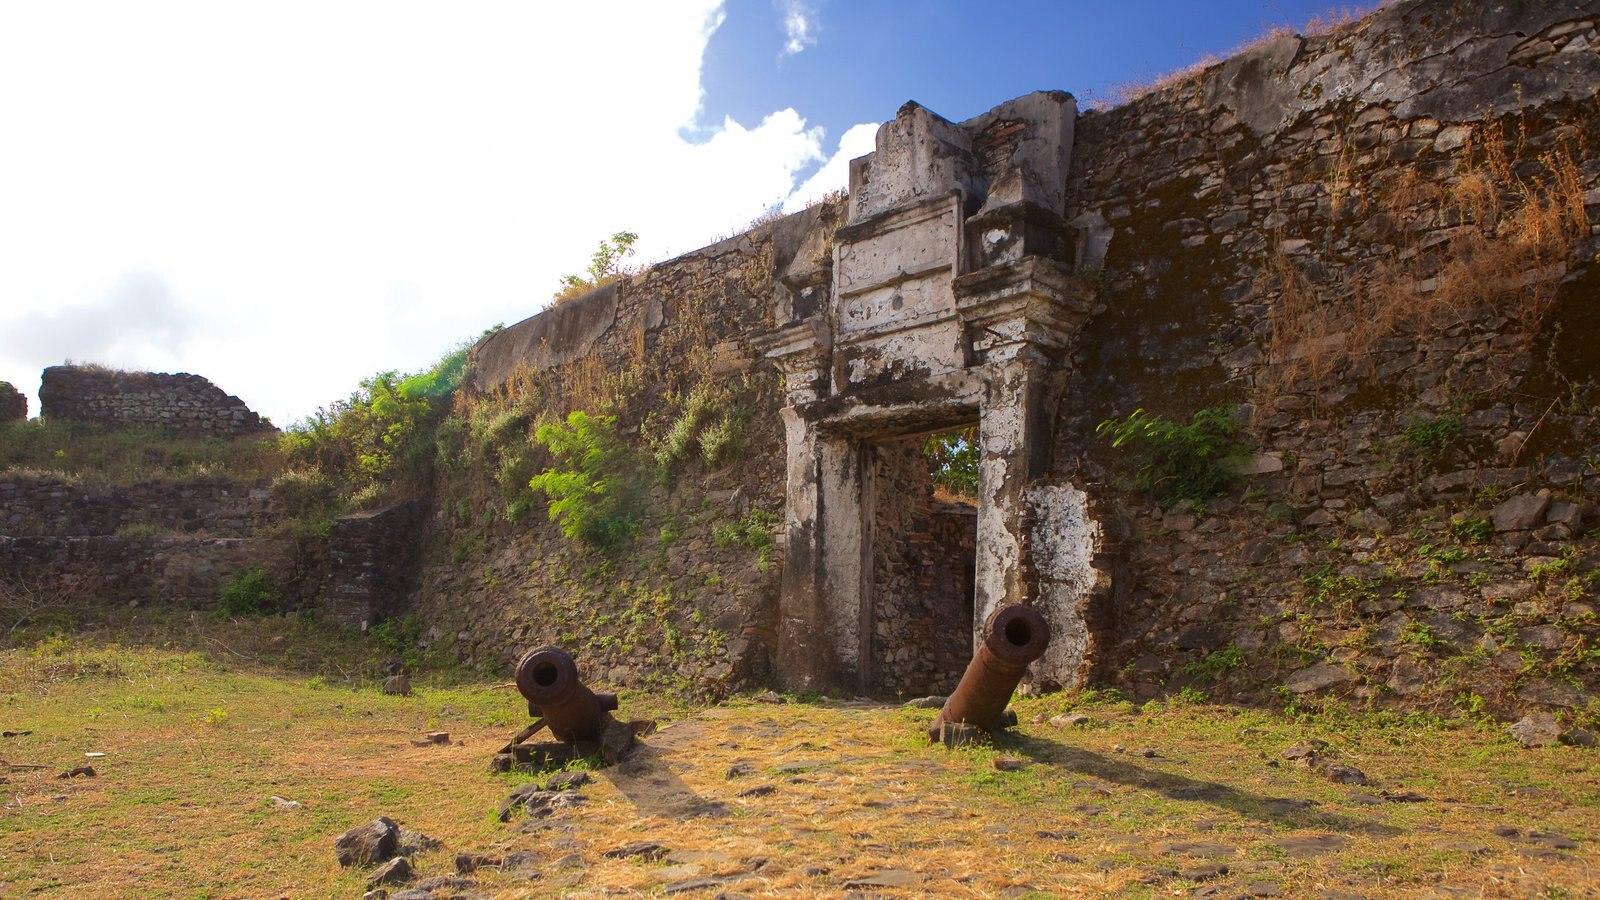 Forte dos Remédios caracterizando itens militares, elementos de patrimônio e ruínas de edifício